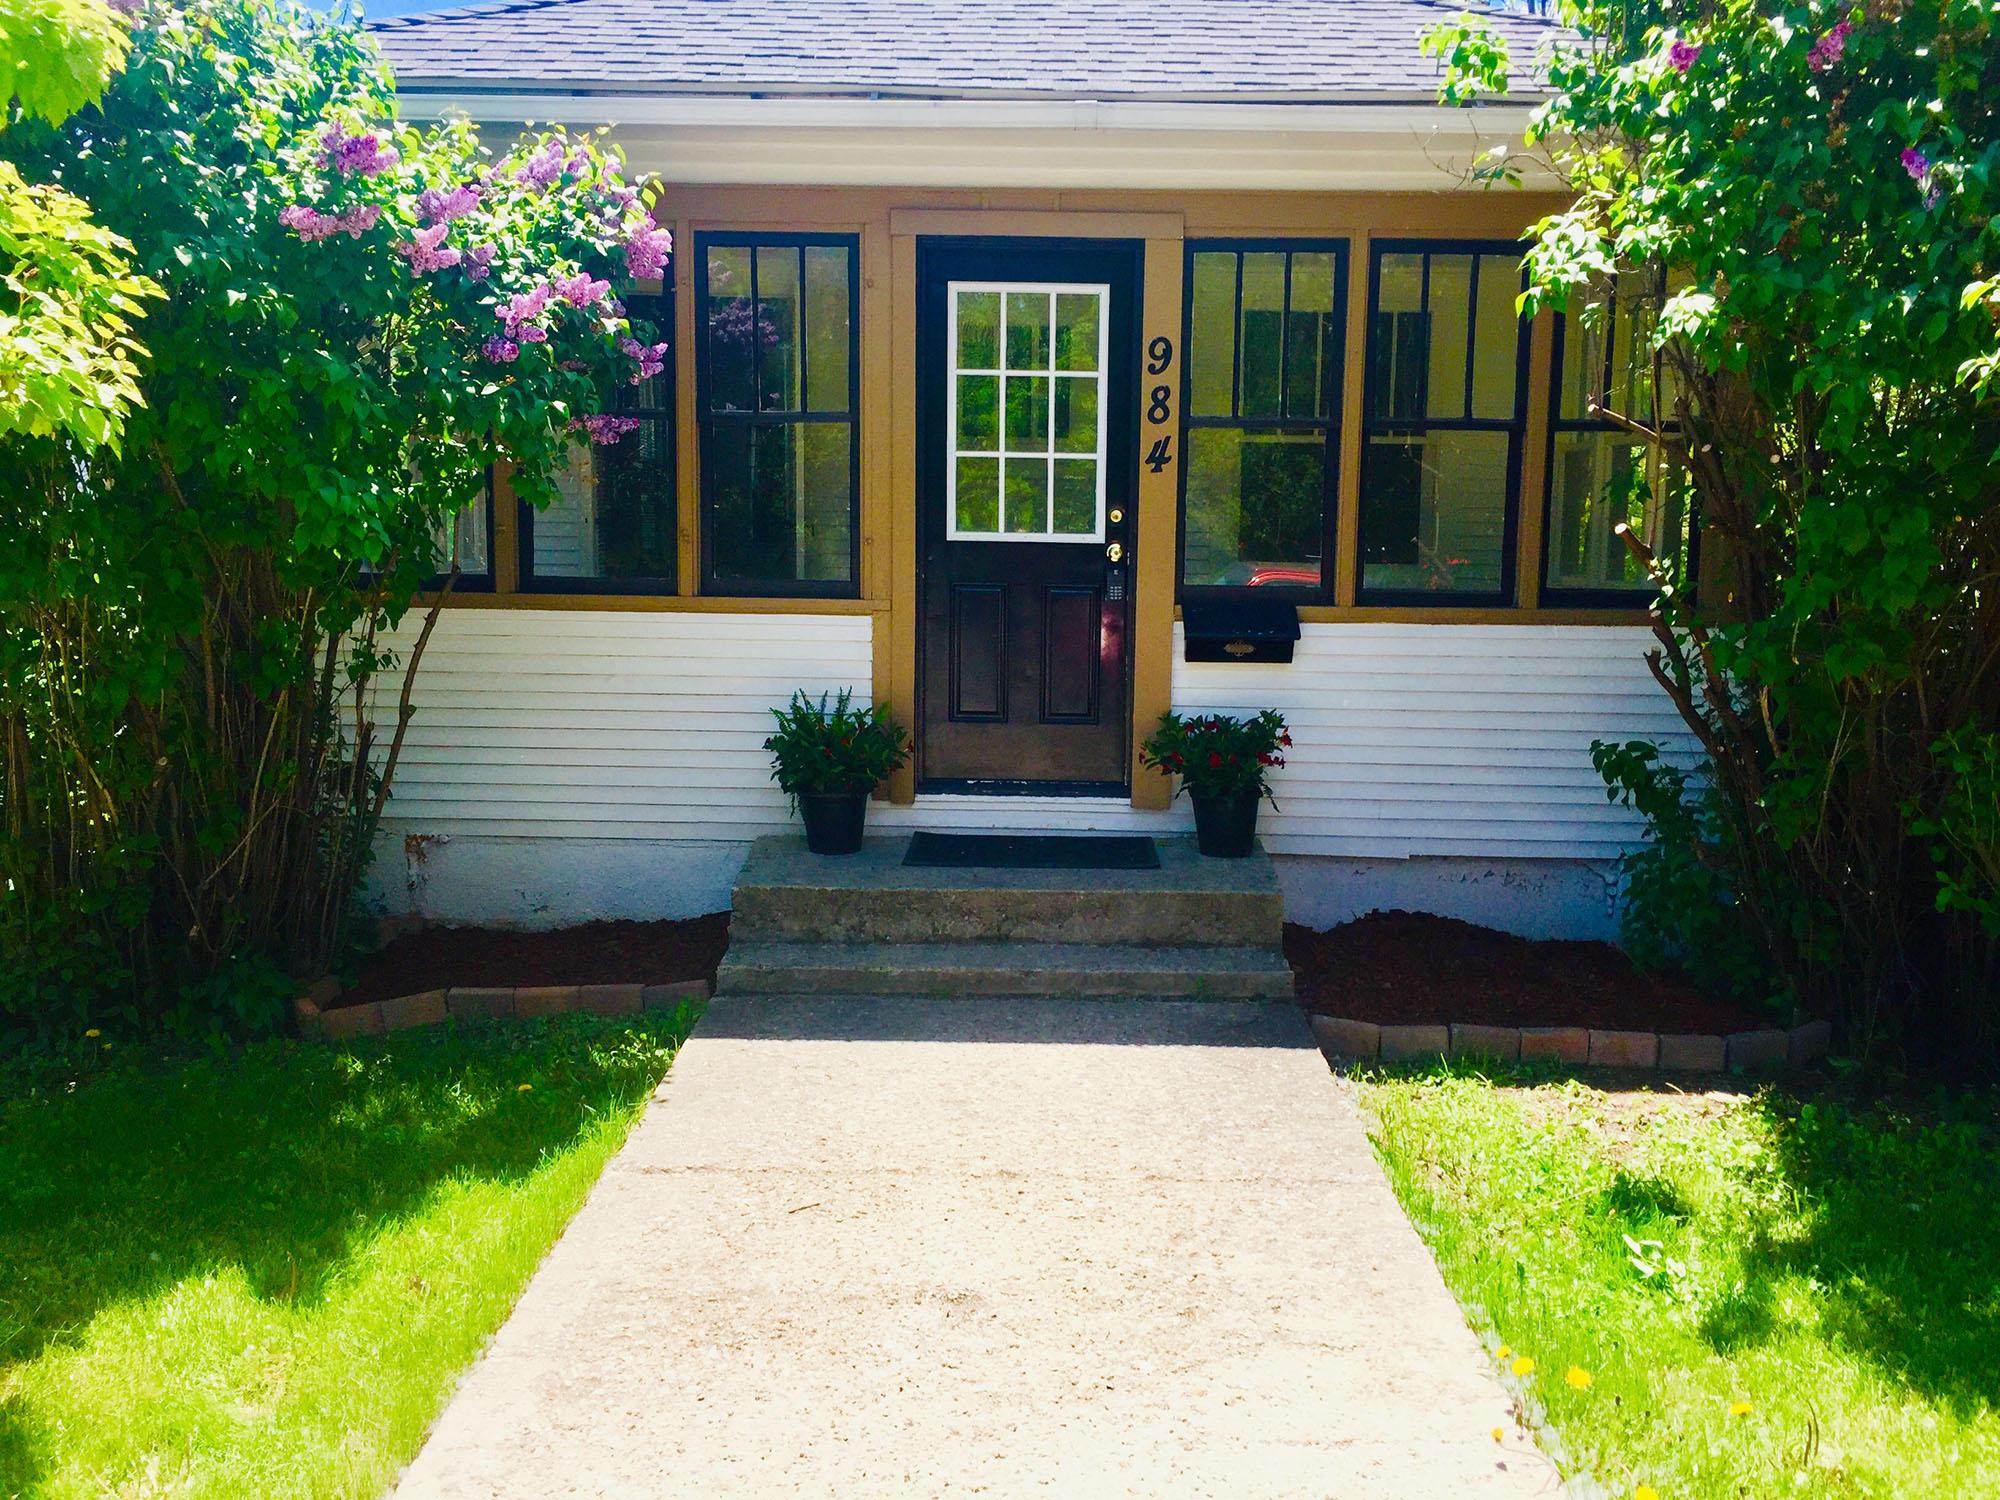 984 W Loucks Street, Sheridan, Wyoming 82801, 1 Bedroom Bedrooms, ,1 BathroomBathrooms,Residential,For Sale,Loucks,19-556